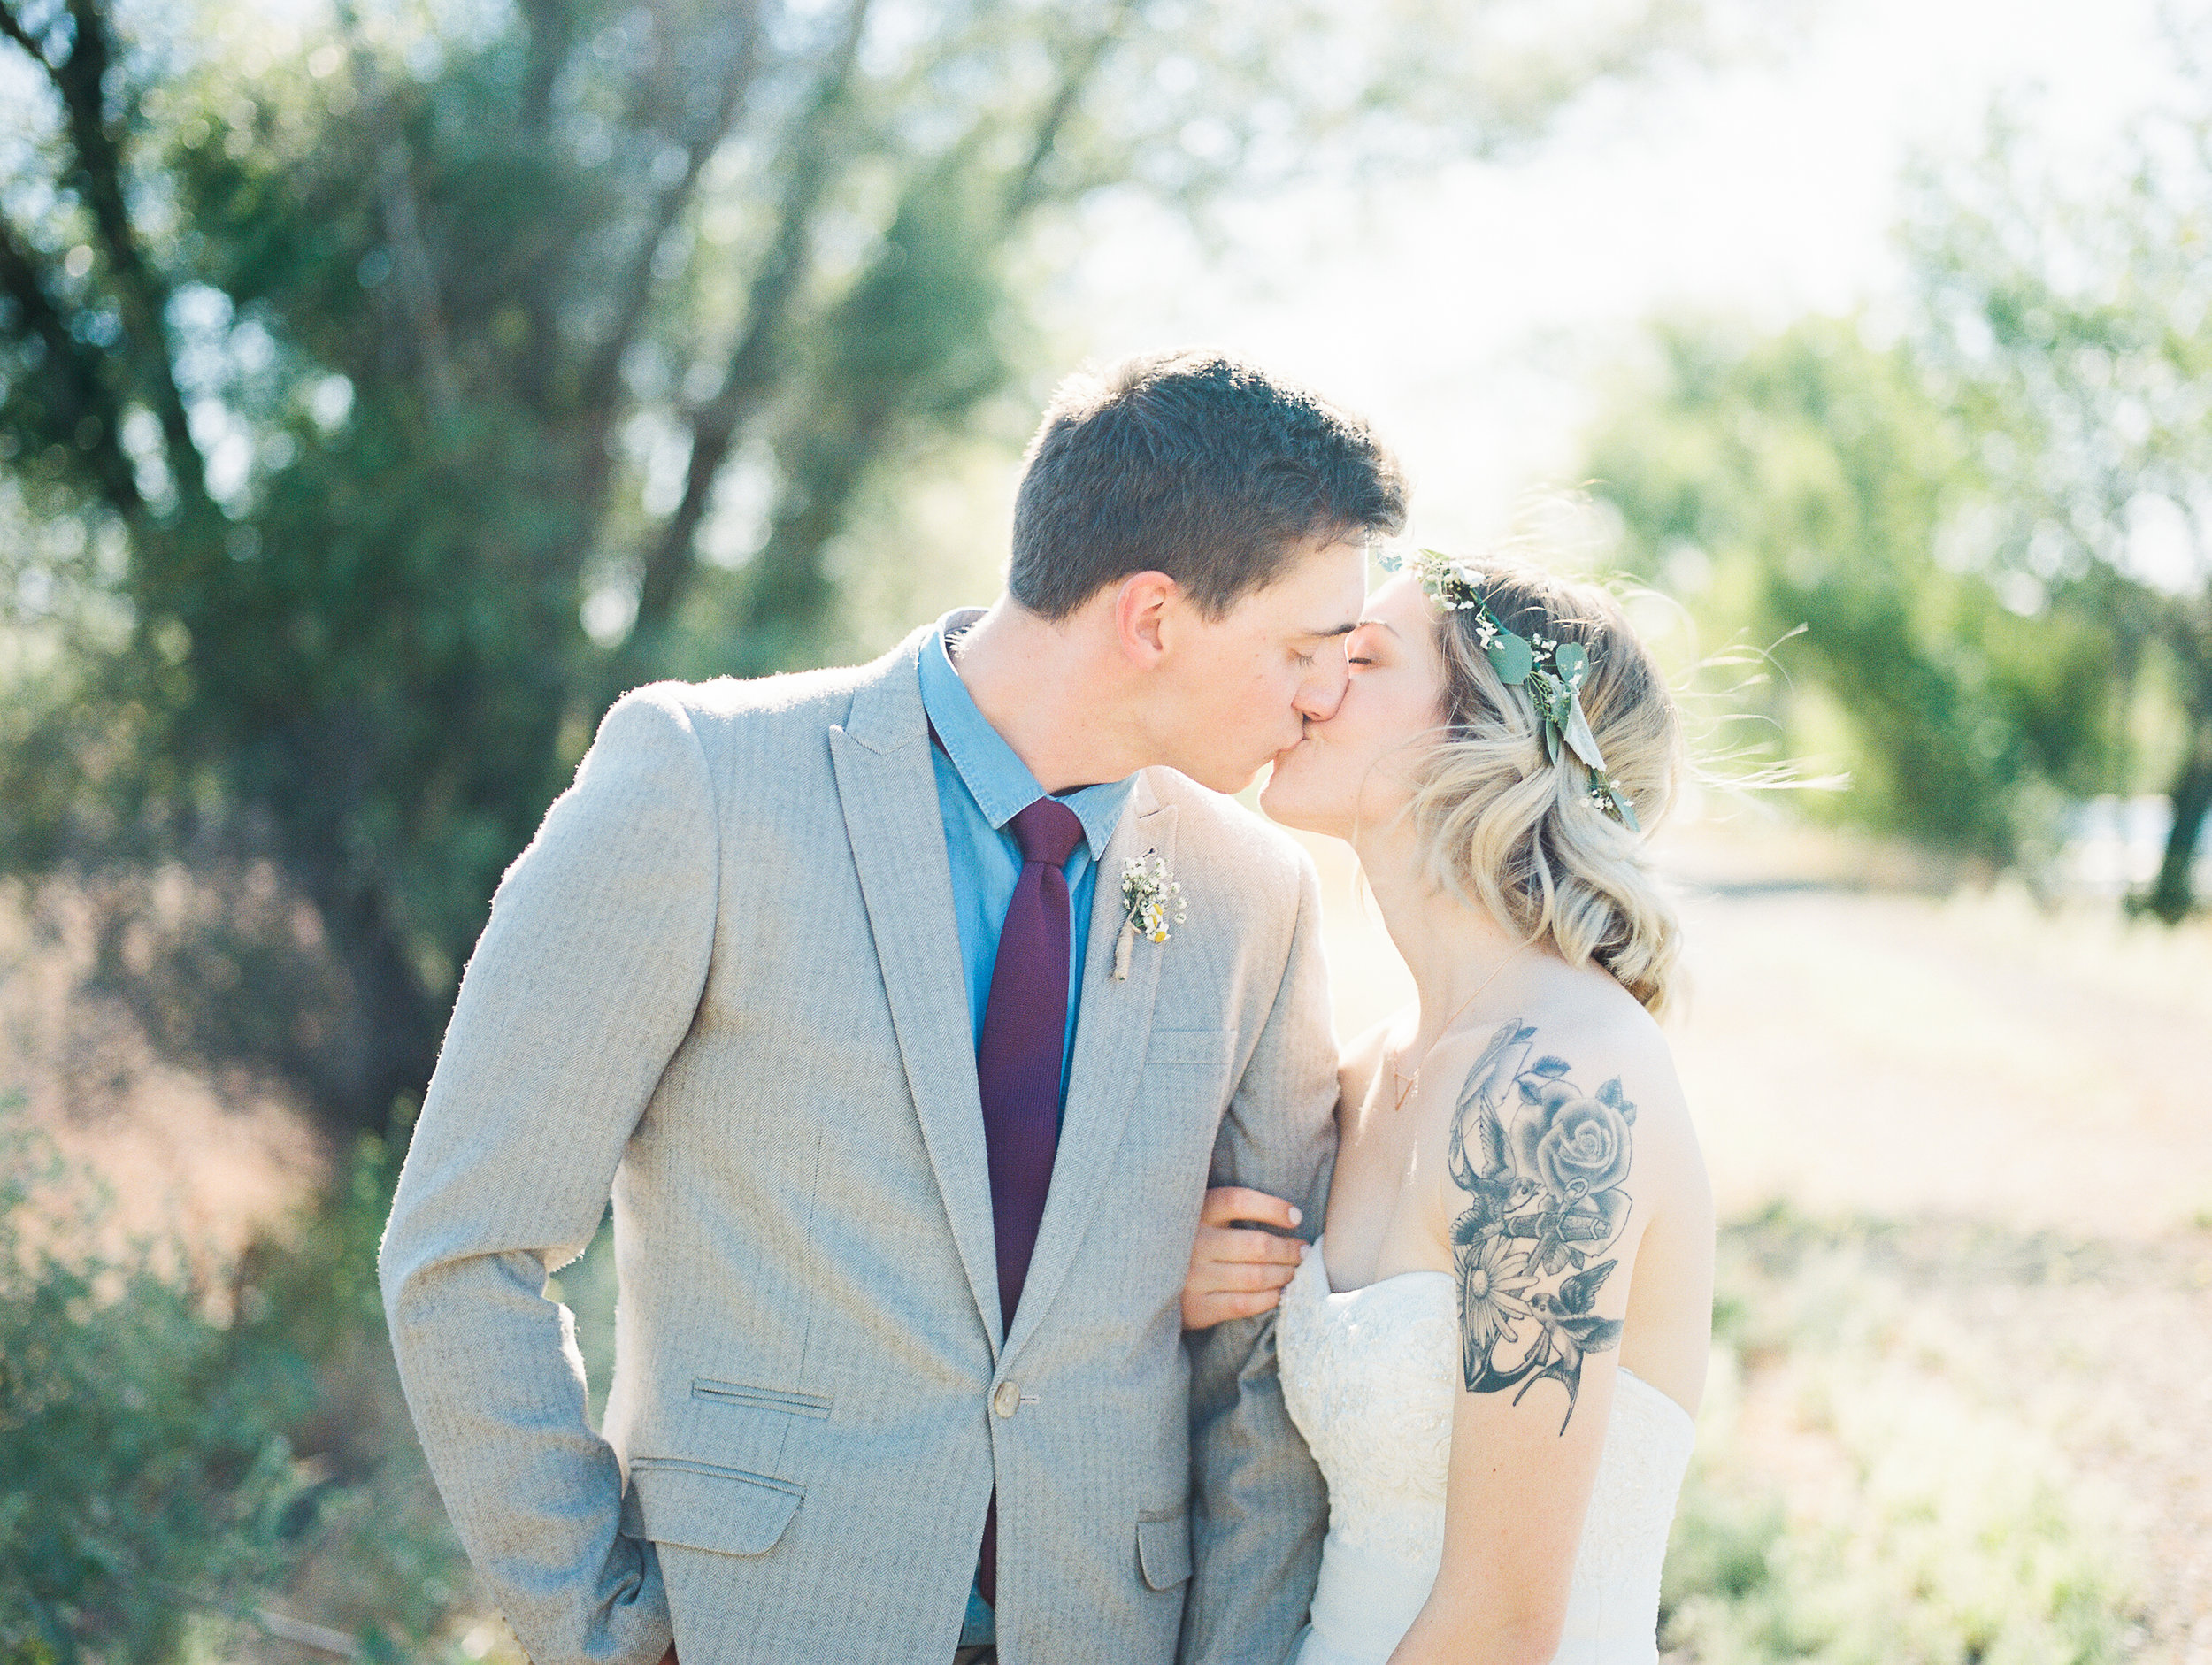 clayton+kennedy-married-filmscans-21.jpg